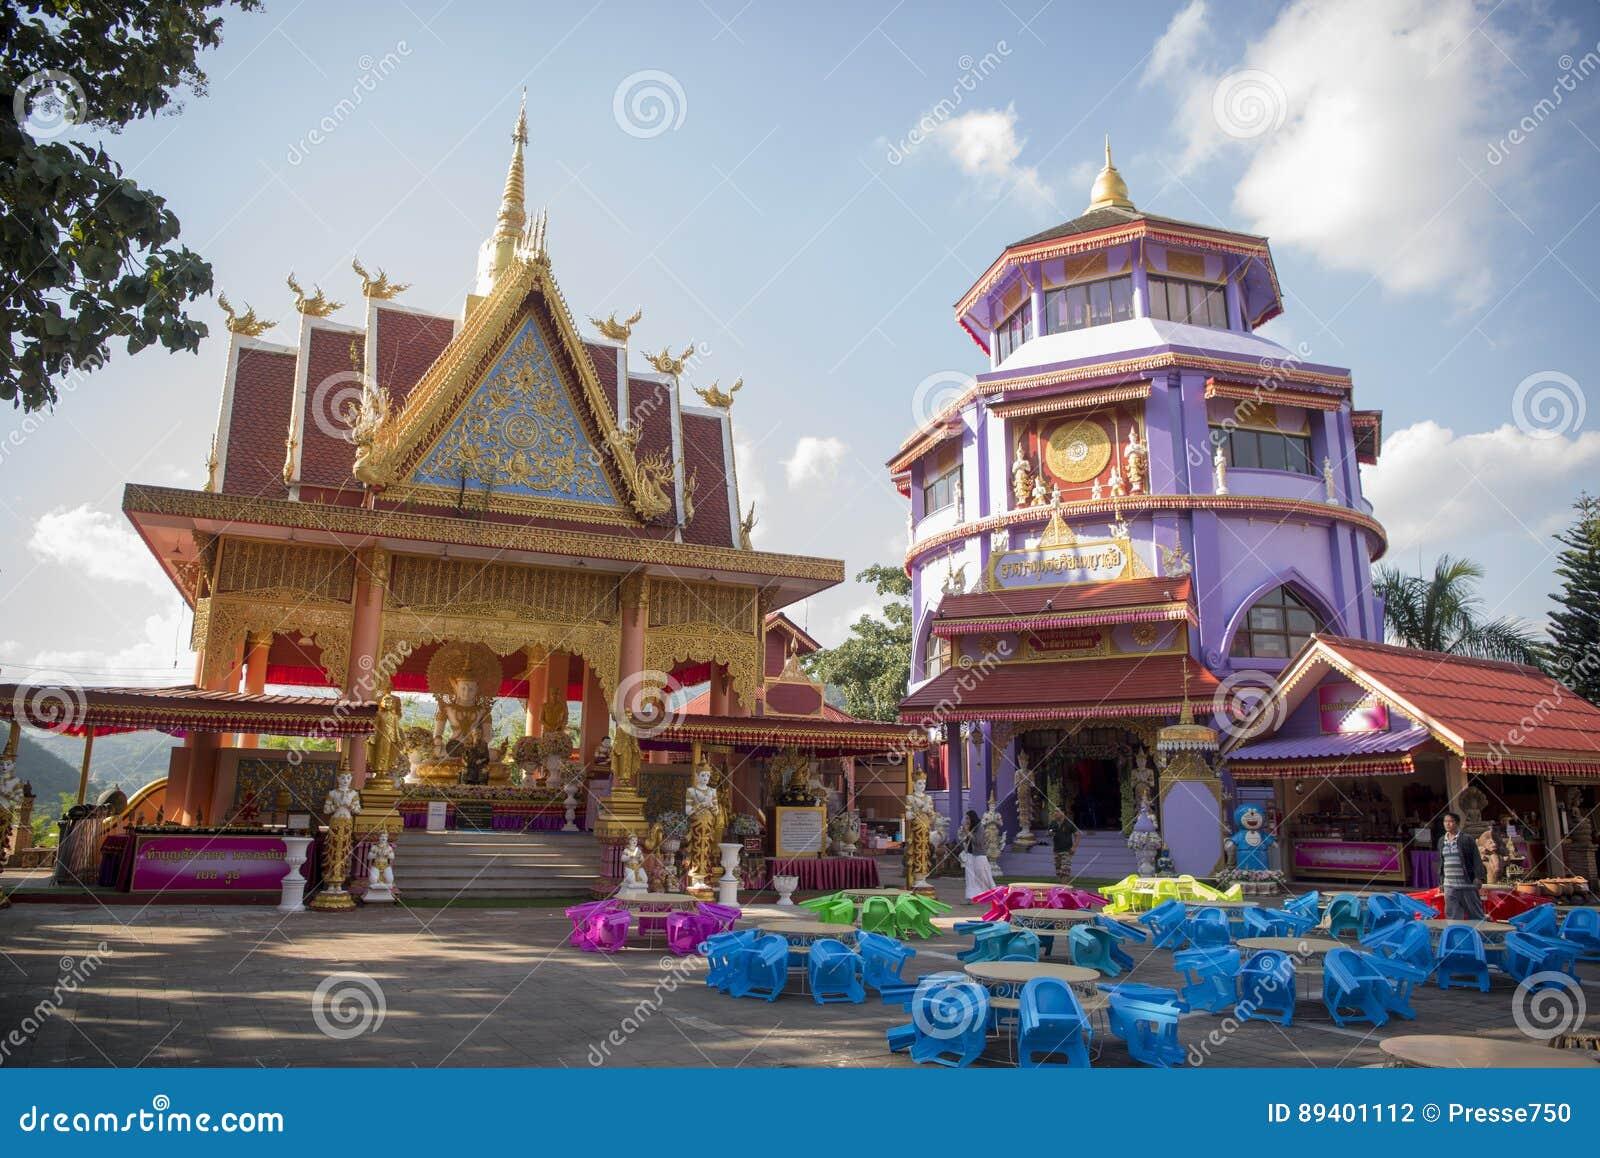 TEMPLO DE TAILÂNDIA CHIANG RAI MAE SAI